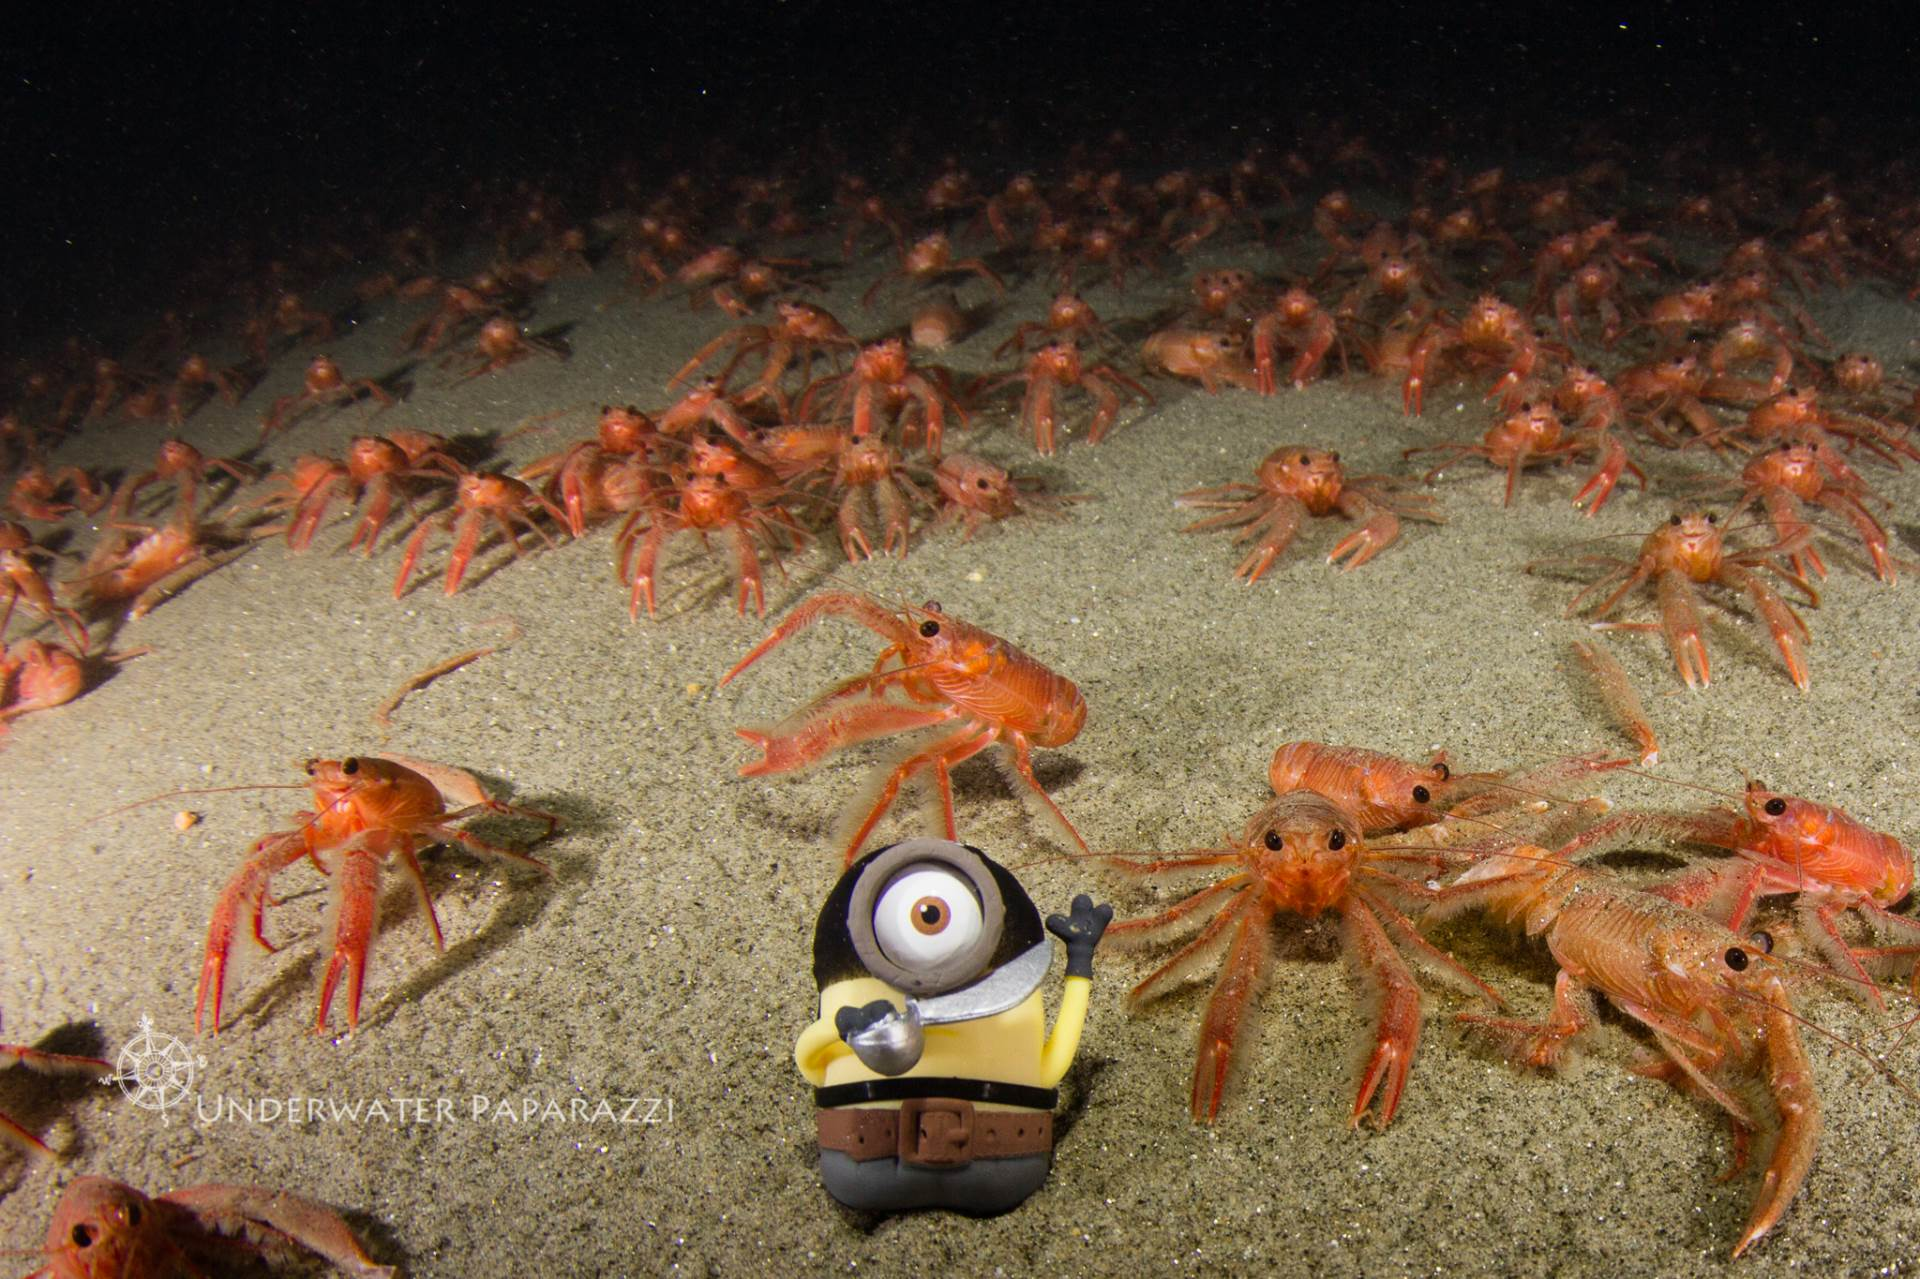 Tuna Crabs take over La jolla Shores at 80 feet below the surface